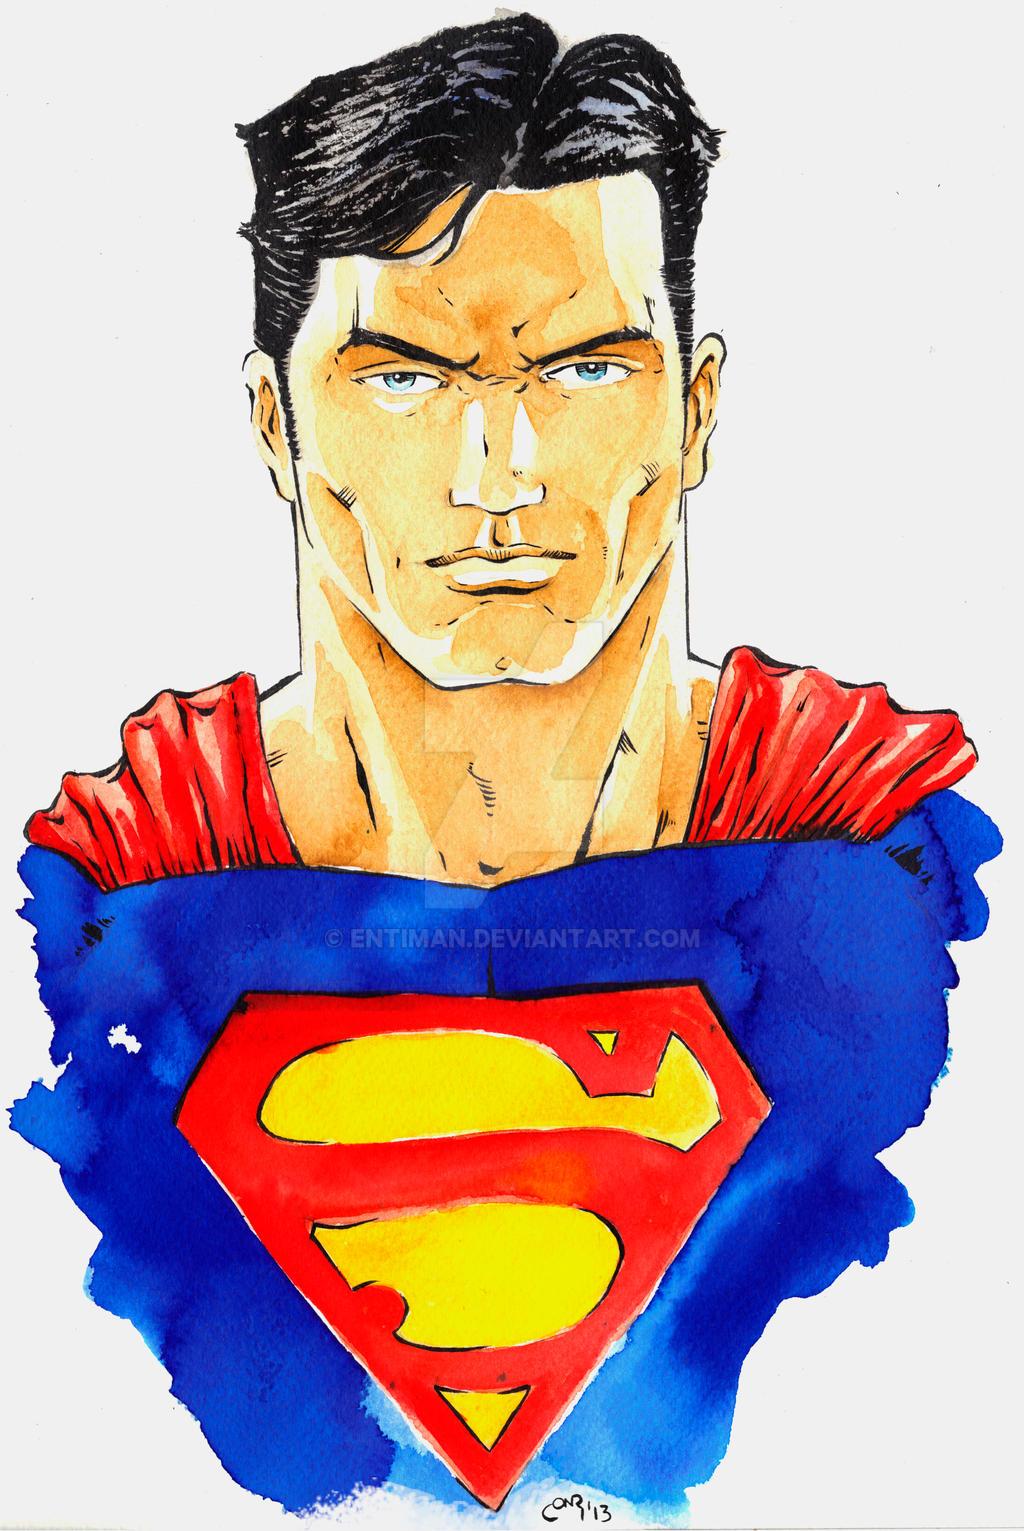 Man Of Steel by Entiman